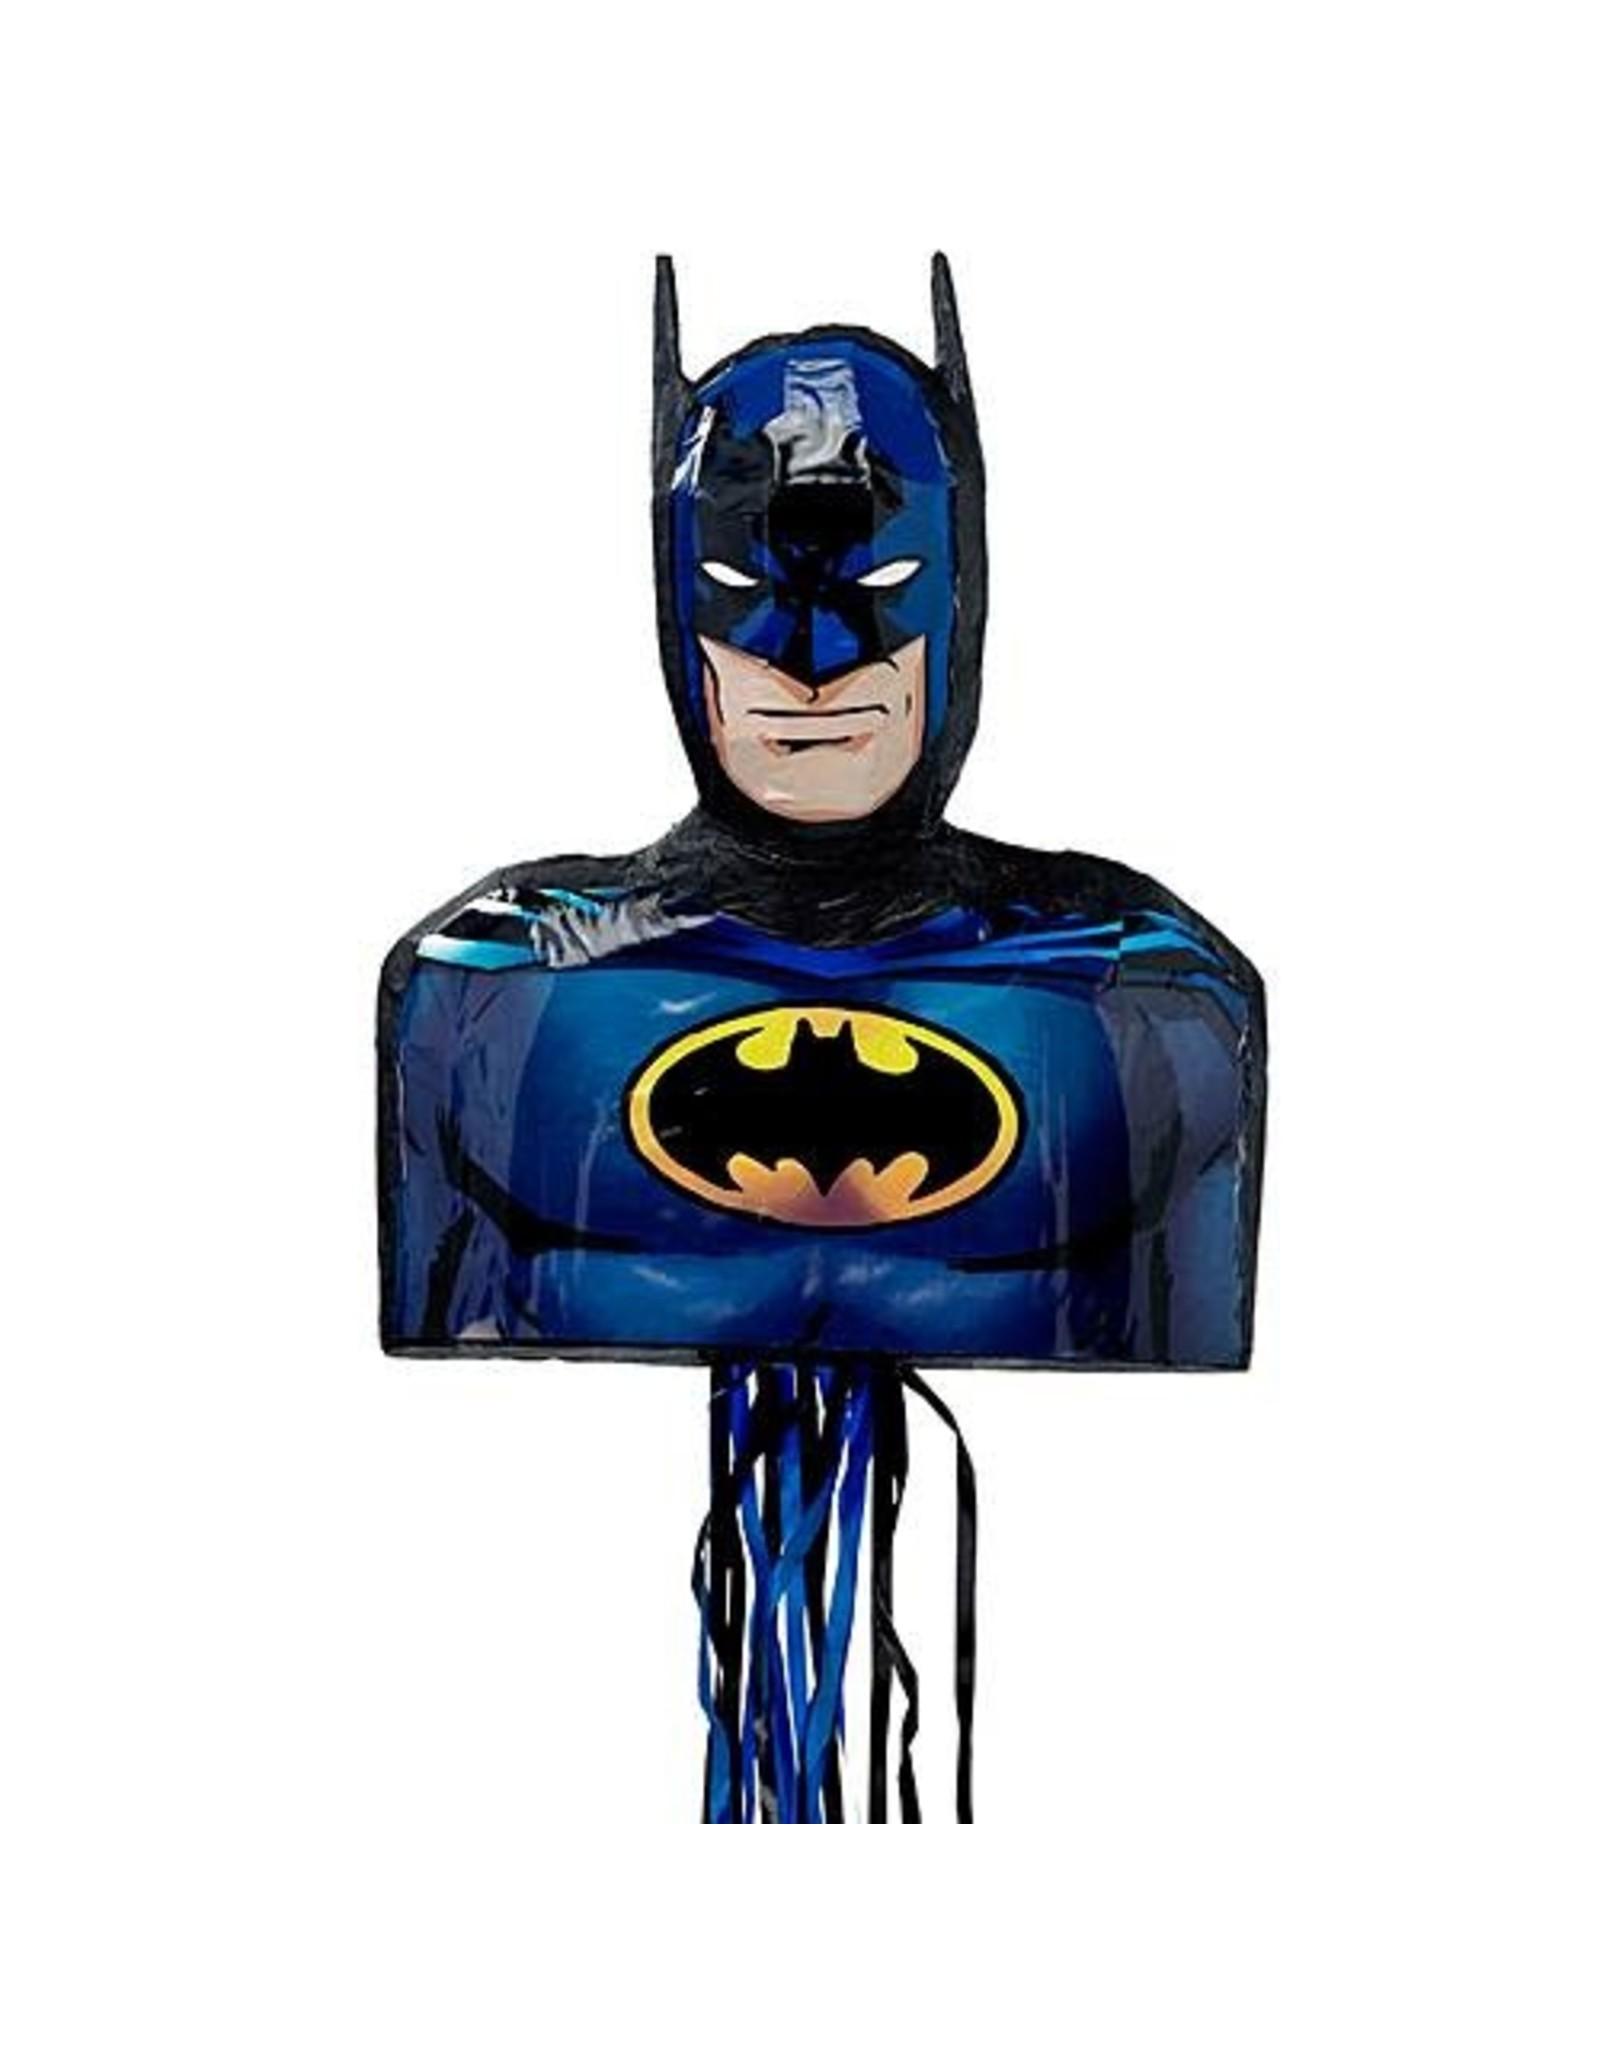 Batman 3D Pull String Pinata